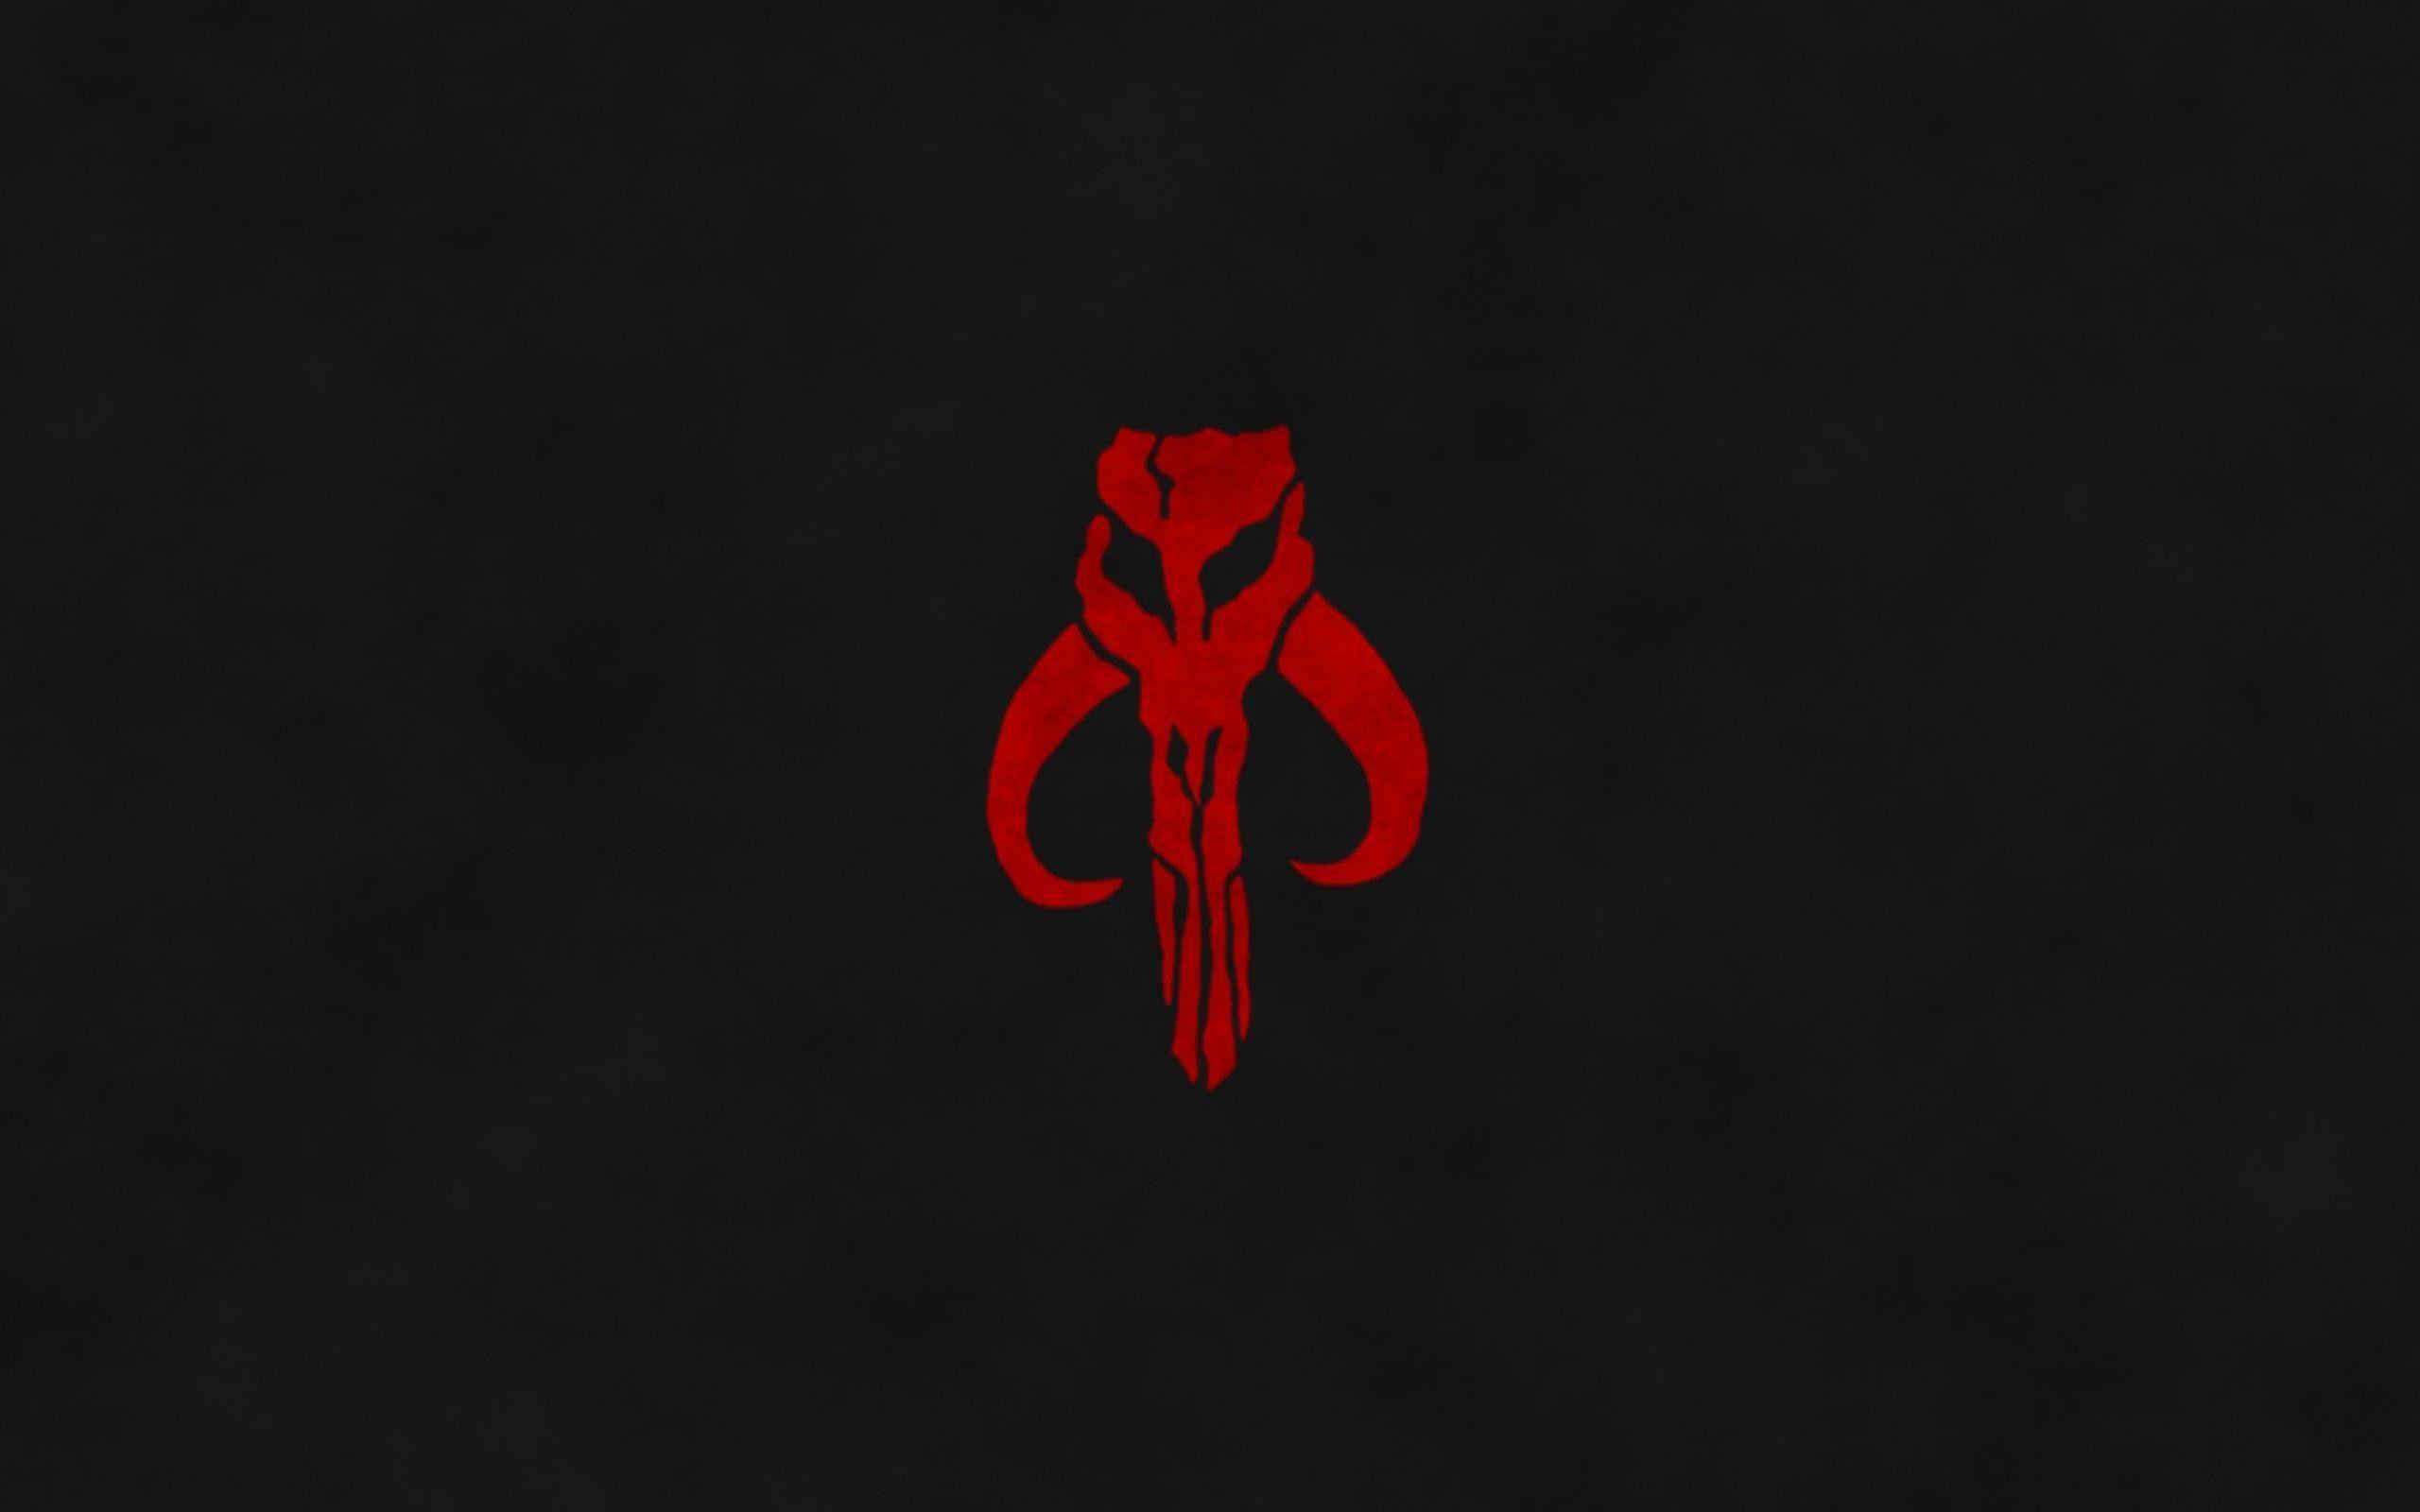 Mandalorian Logo Wallpapers Top Free Mandalorian Logo Backgrounds Wallpaperaccess